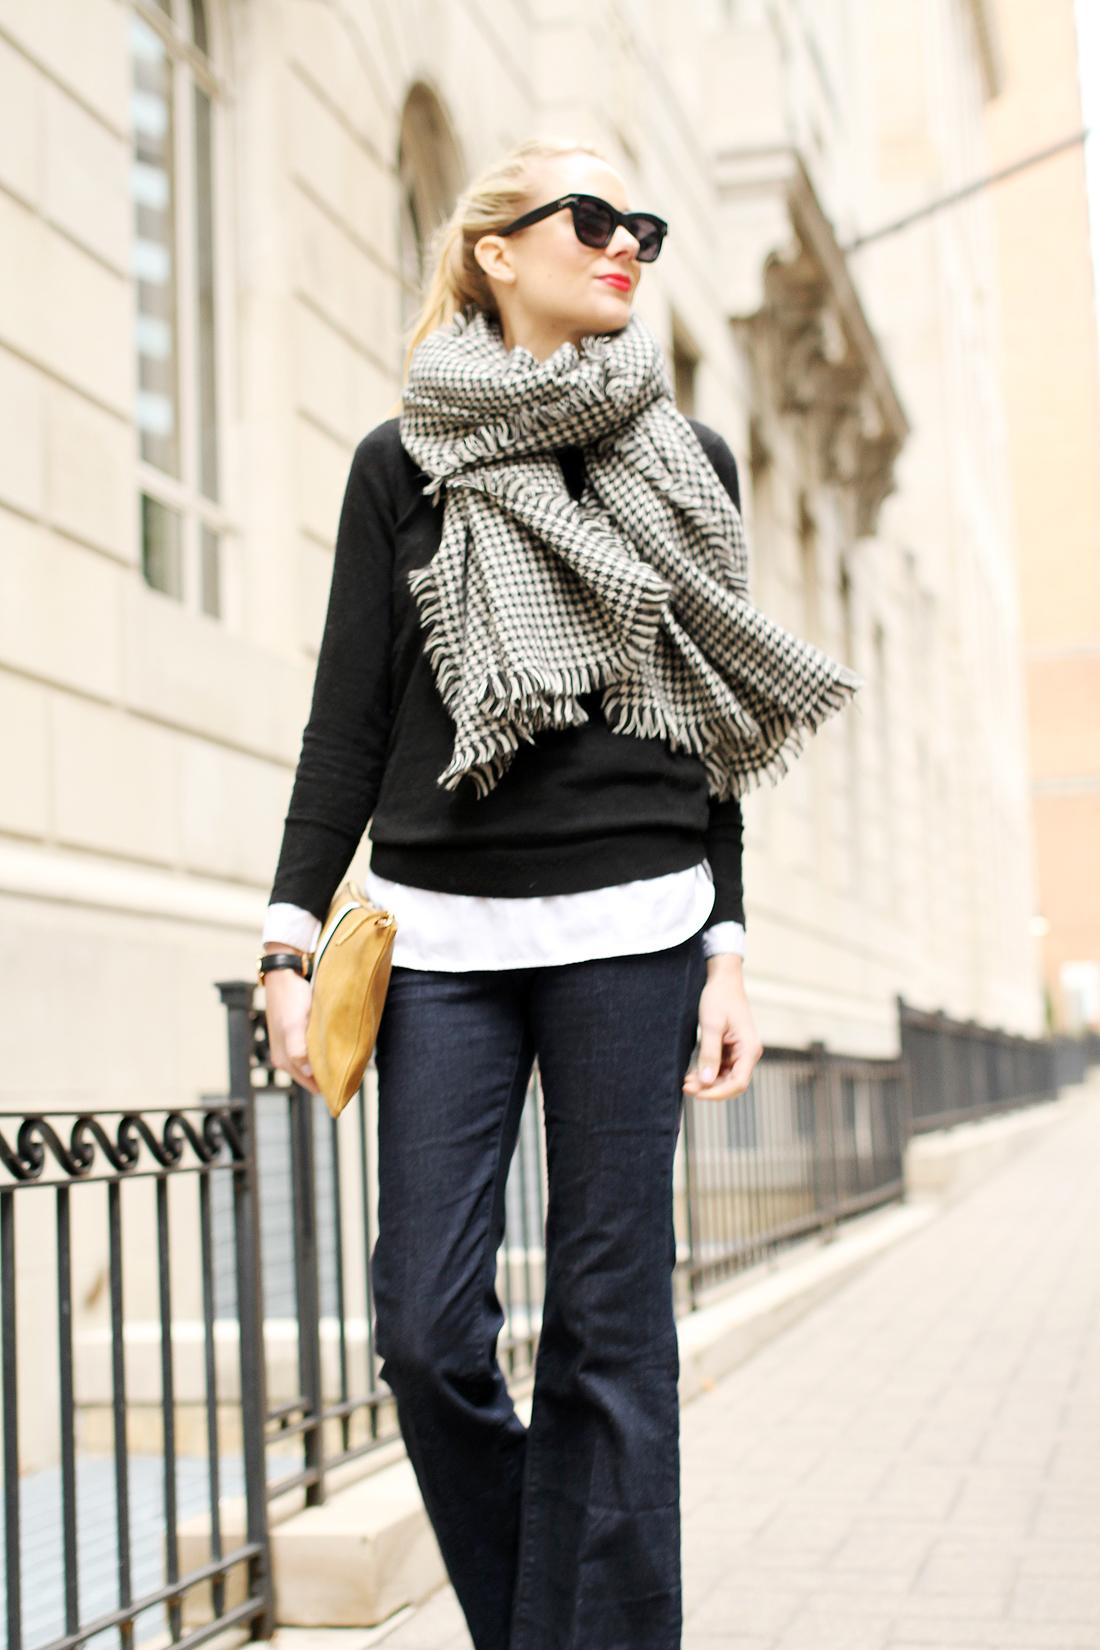 fashion-jackson-houndstooth-scarf-denim-flare-jeans-black-sweater-celine-sunglasses